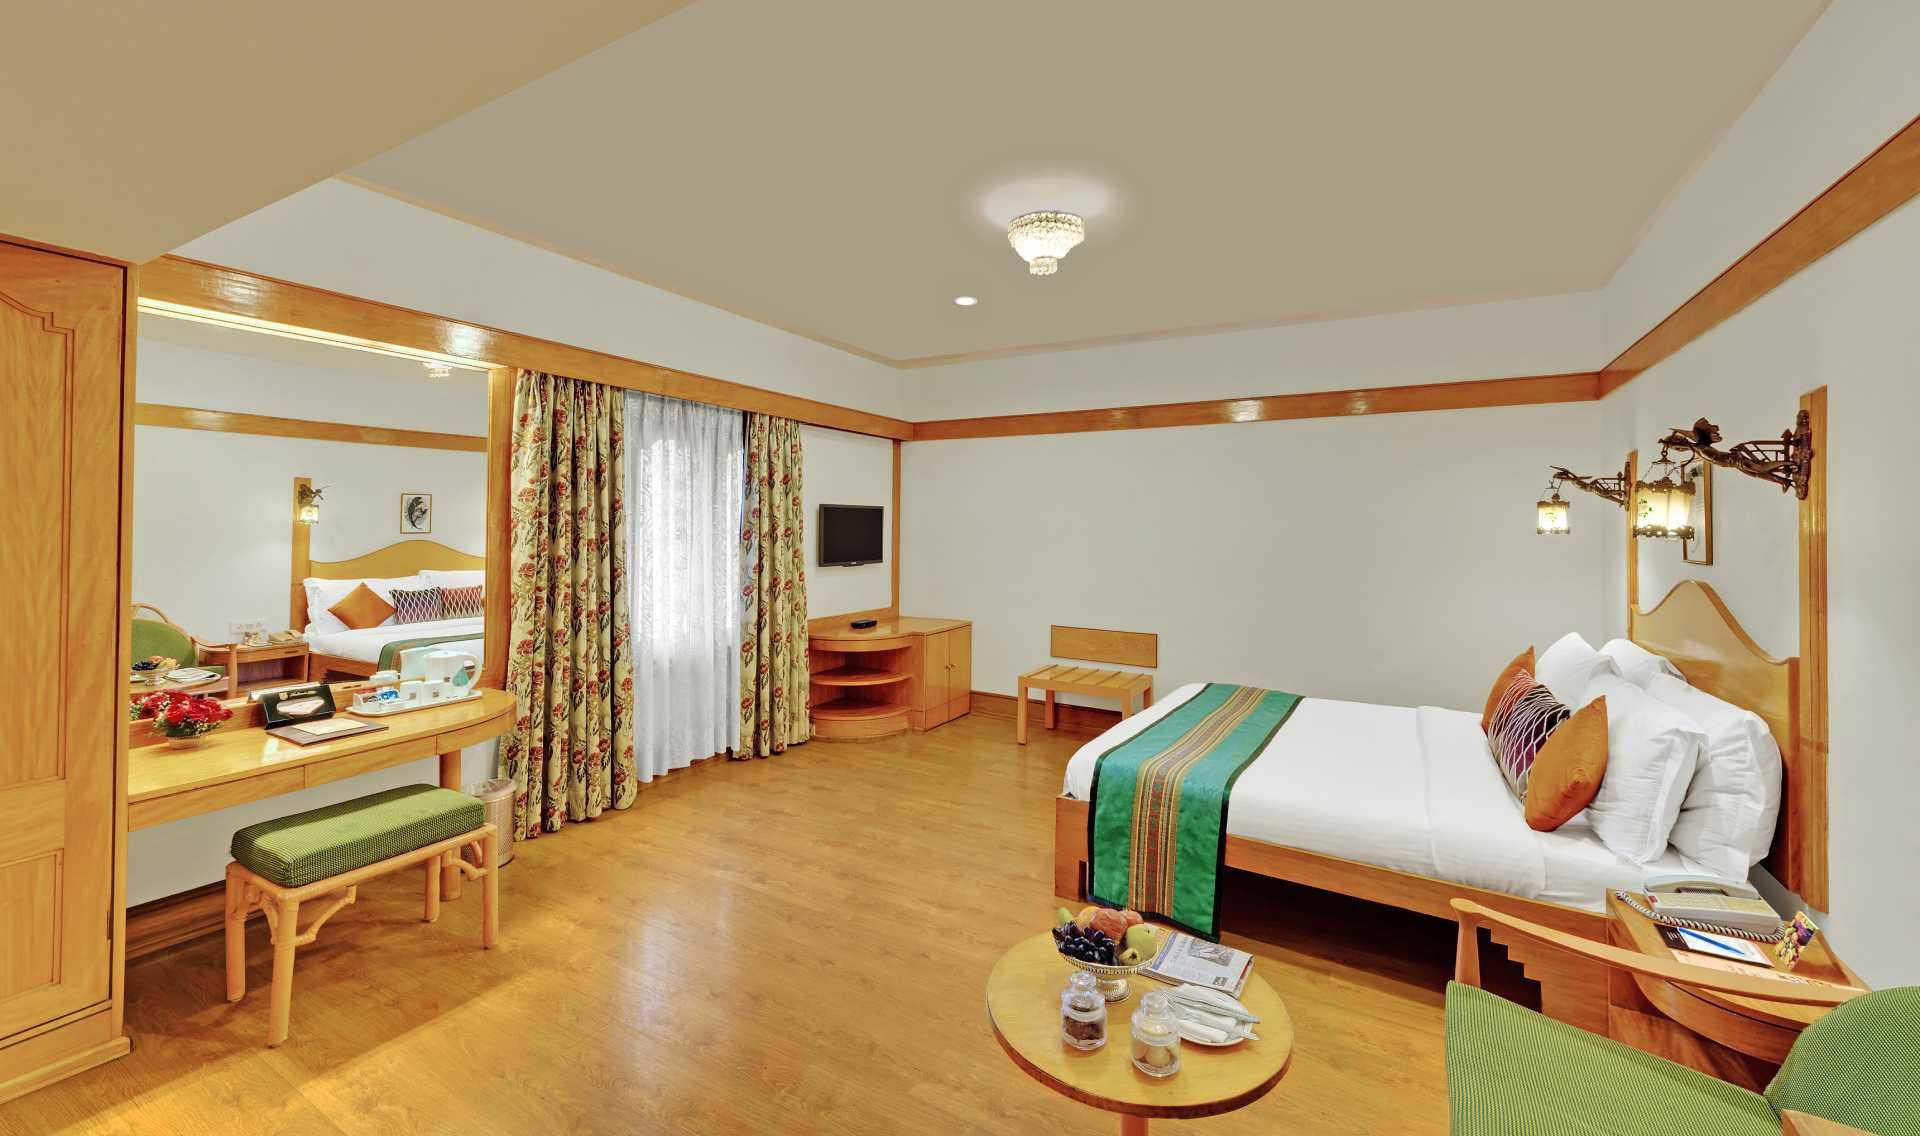 Chennai Heritage Room Ambassador Pallava - The Ambassador | Heritage Hotels in Mumbai, Aurangabad, Chennai - Our Rooms